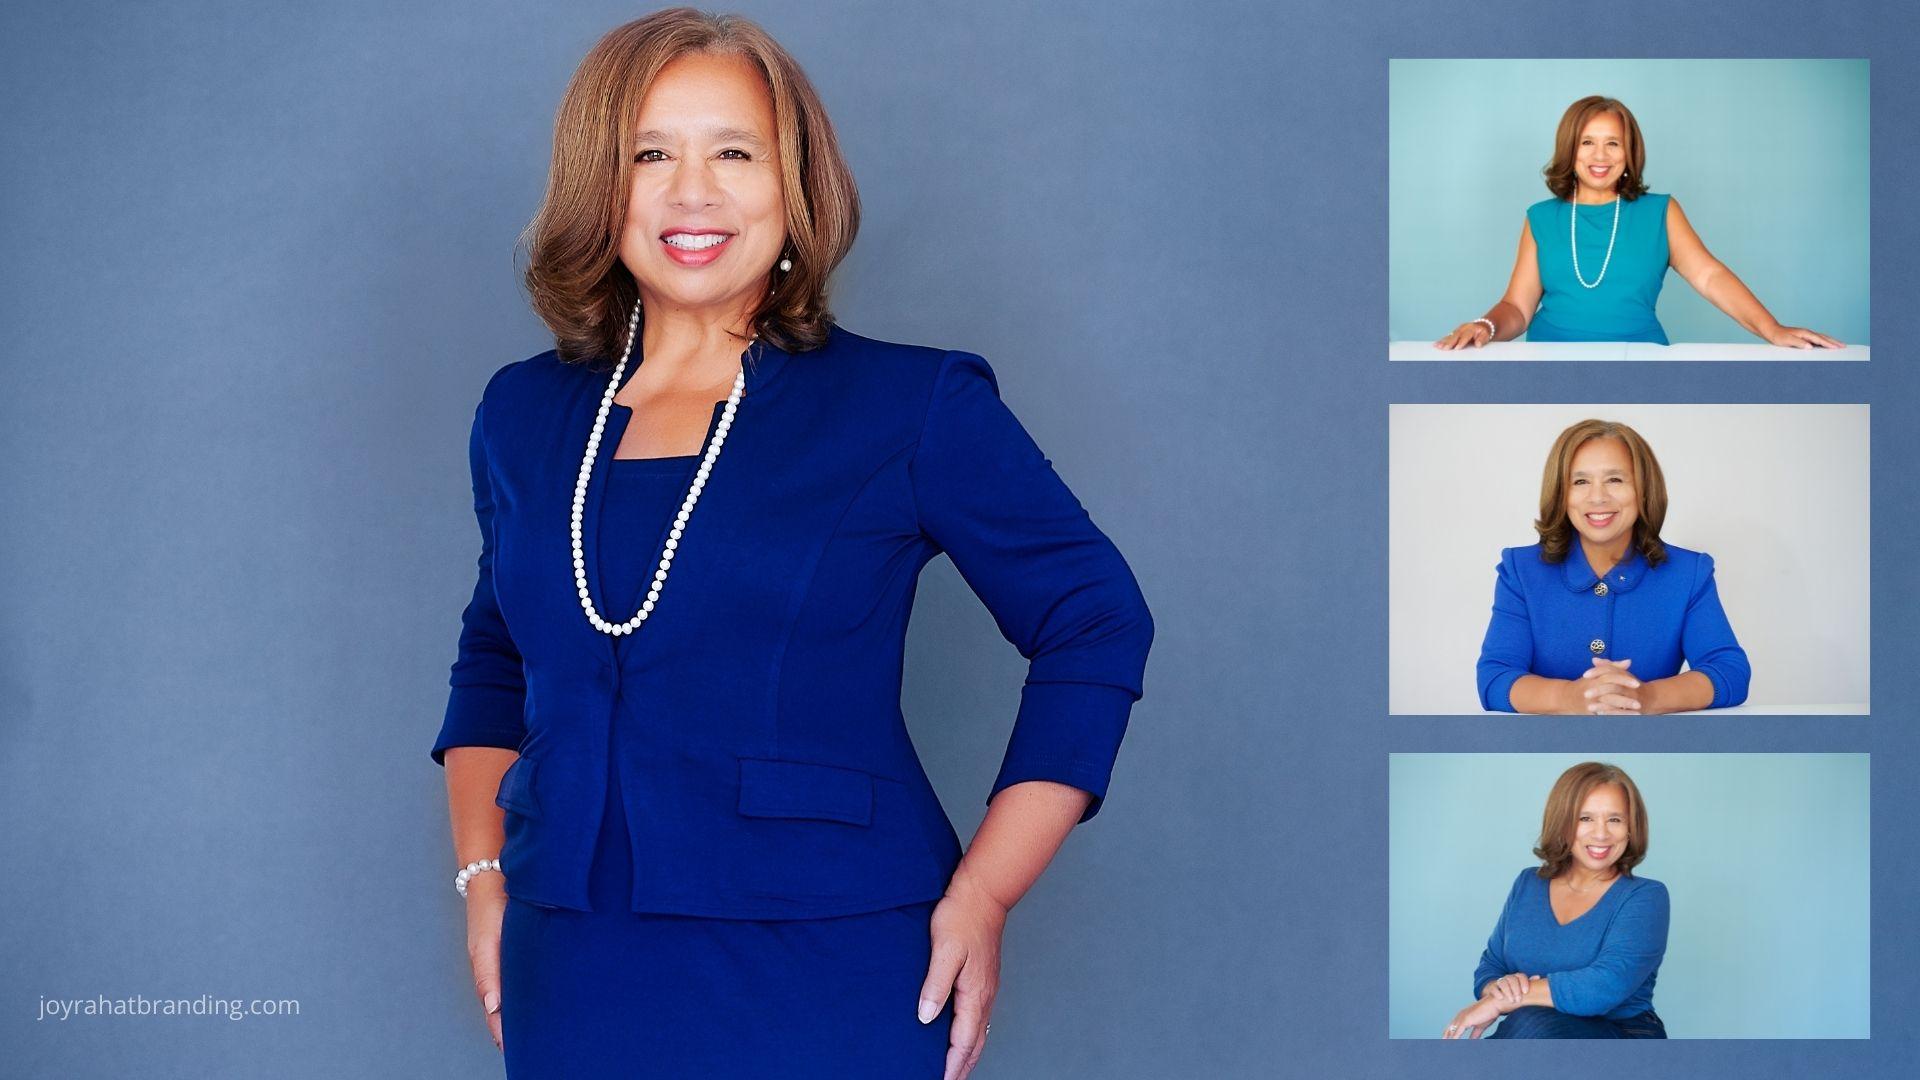 Personal branding portraits for mature women